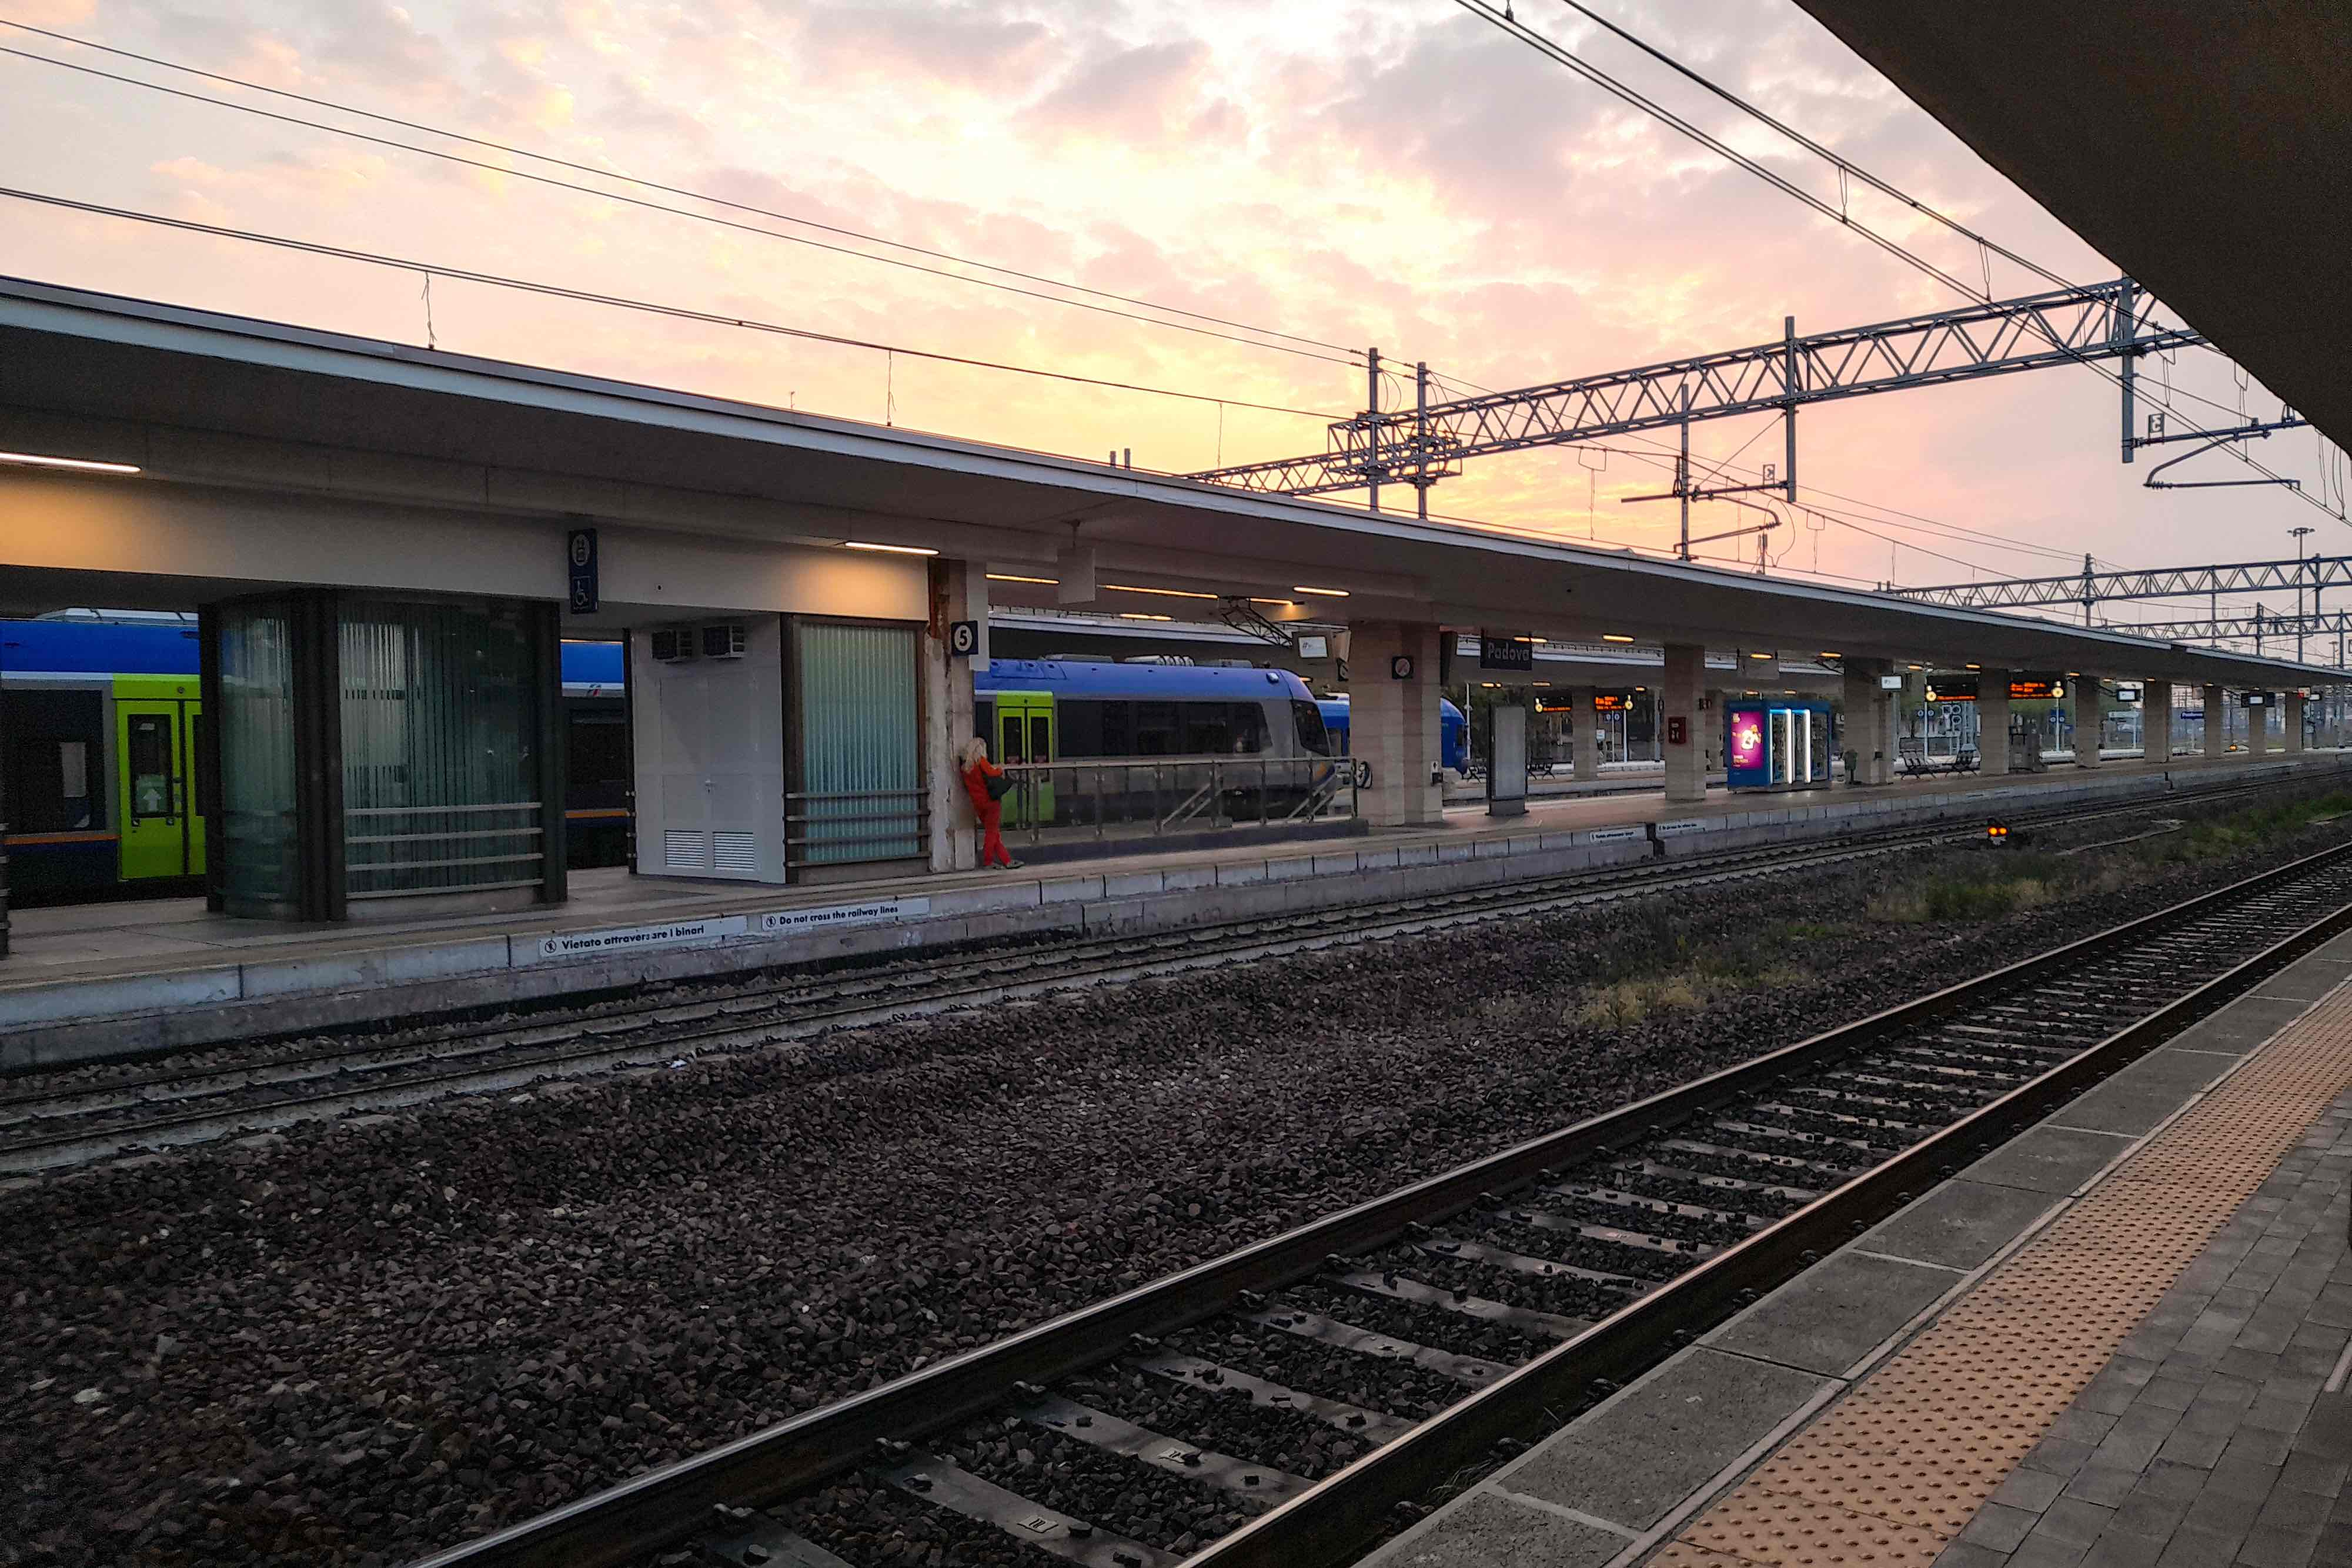 Maliha_Binte_Mahabubferrovia_stazione_Padova_small